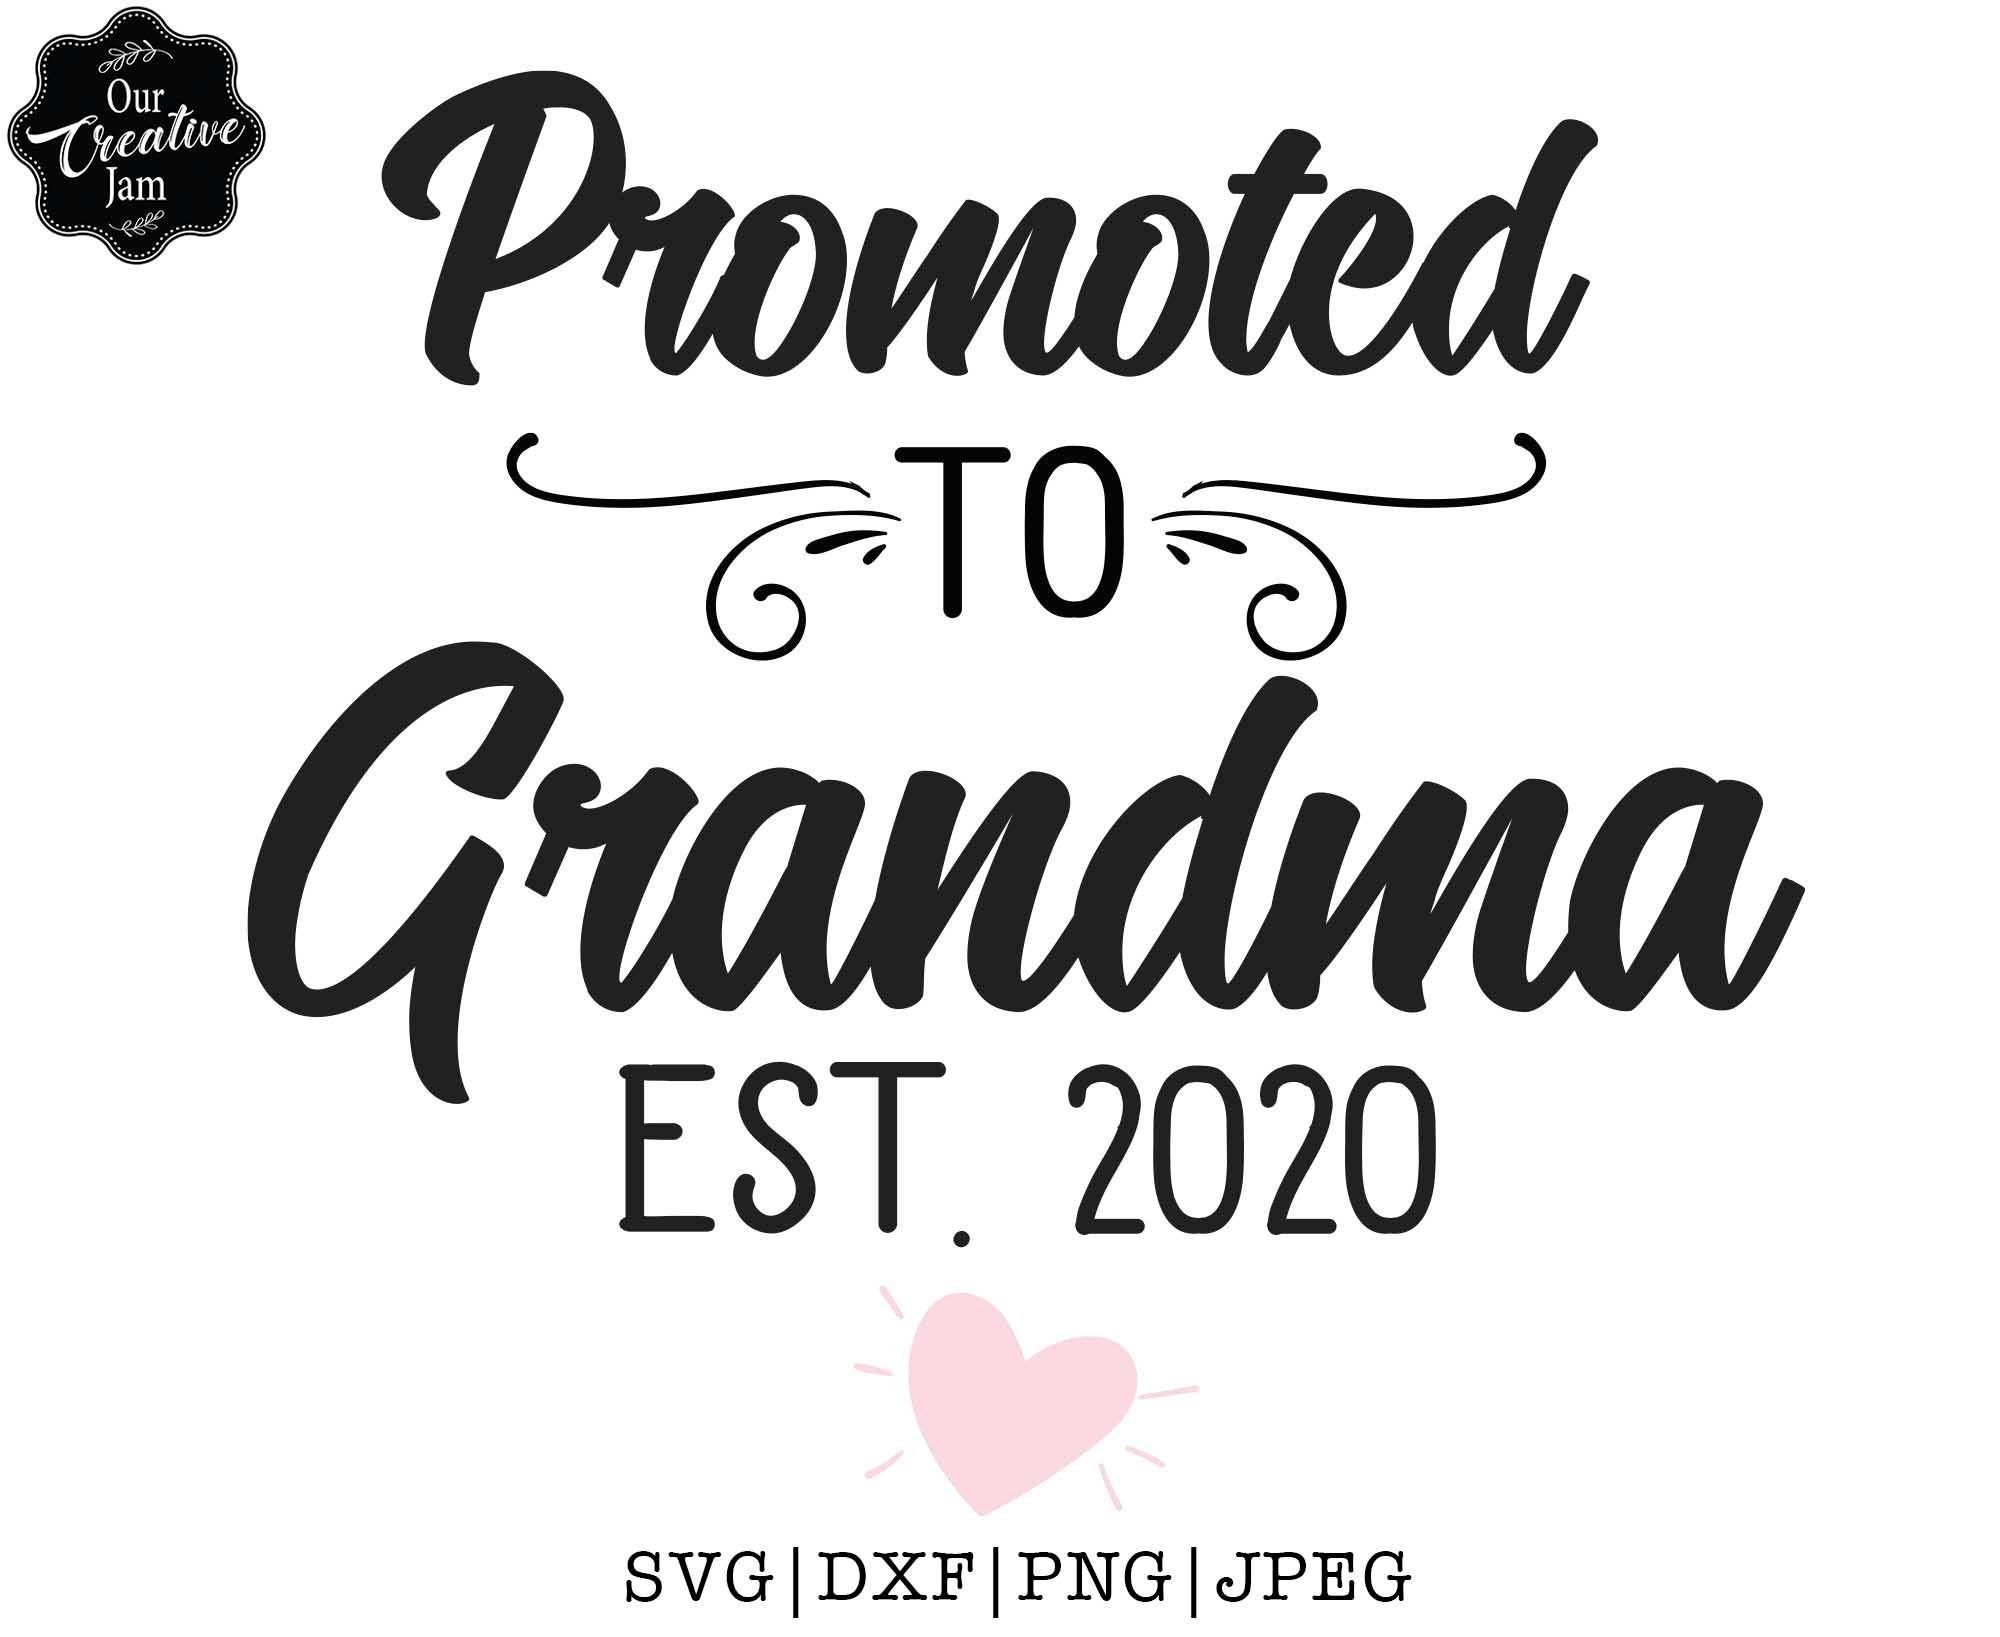 Download Promoted to Grandma EST 2020 future grandma svg new | Etsy ...